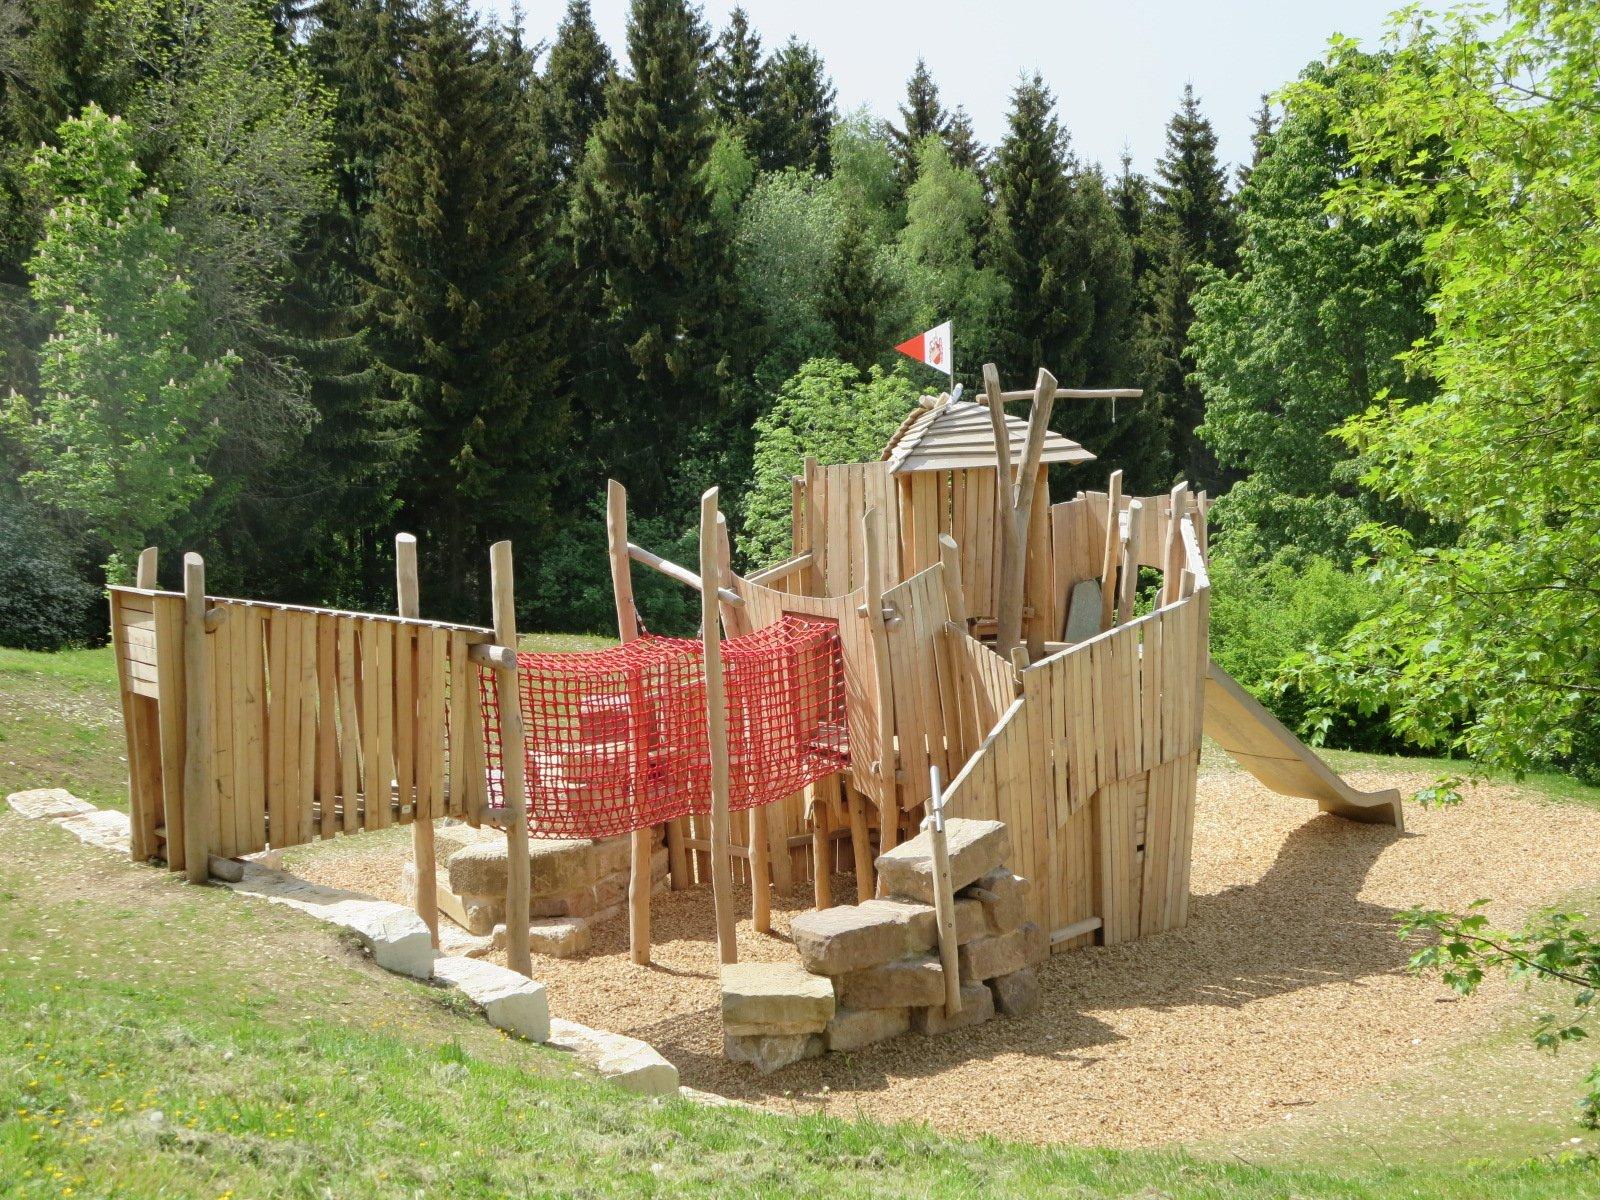 Erlebnistreff Burg Oberhohenberg - Spielplatz